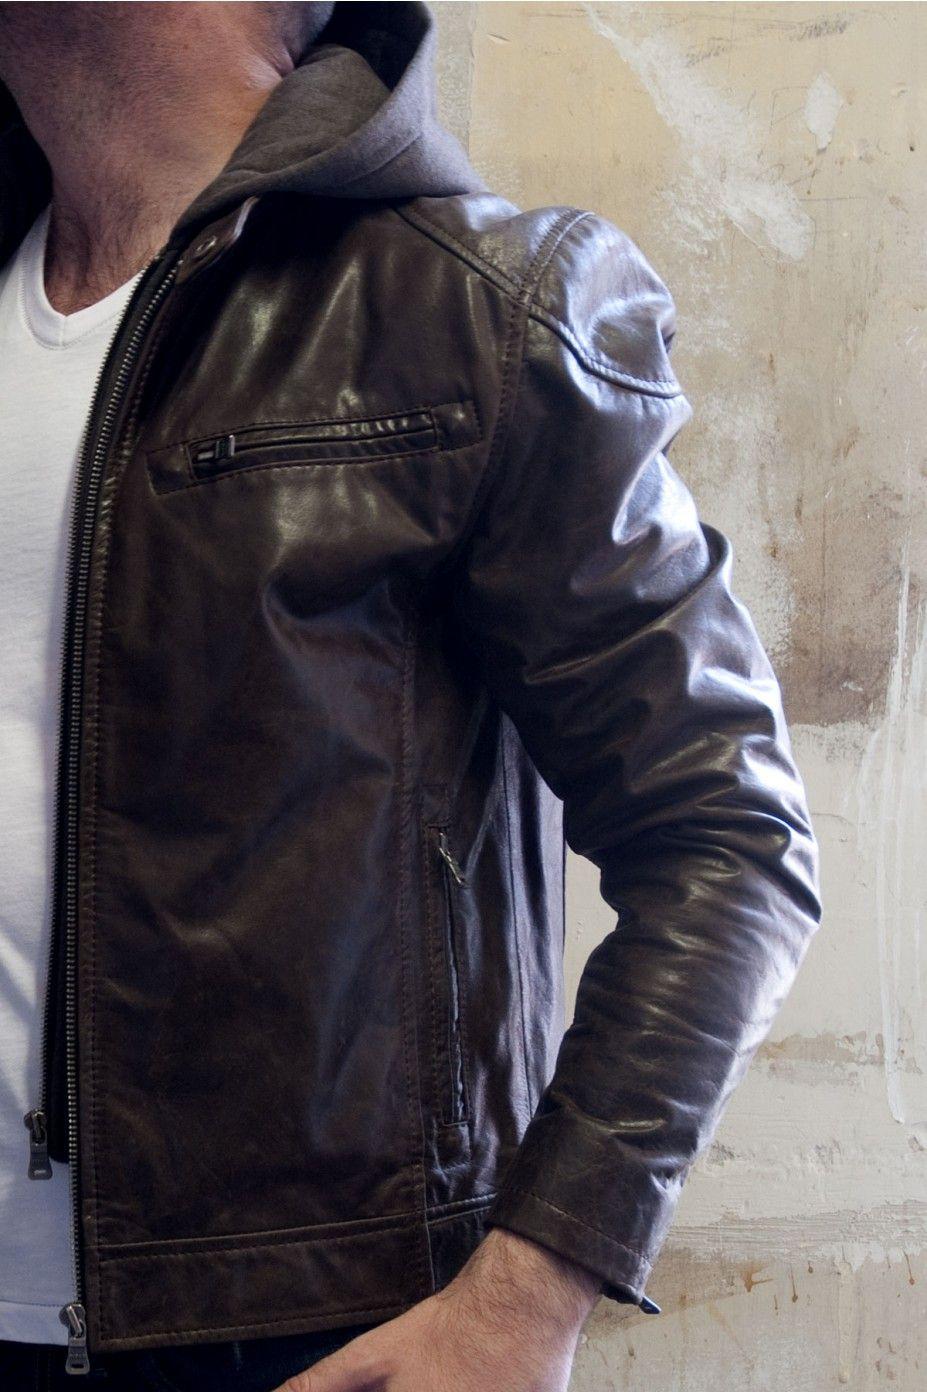 Gipsy Biko Men S Buff Toledo Brown Leather Jacket Leather Jacket Men Leather Jacket Brown Leather Jacket [ 1392 x 927 Pixel ]